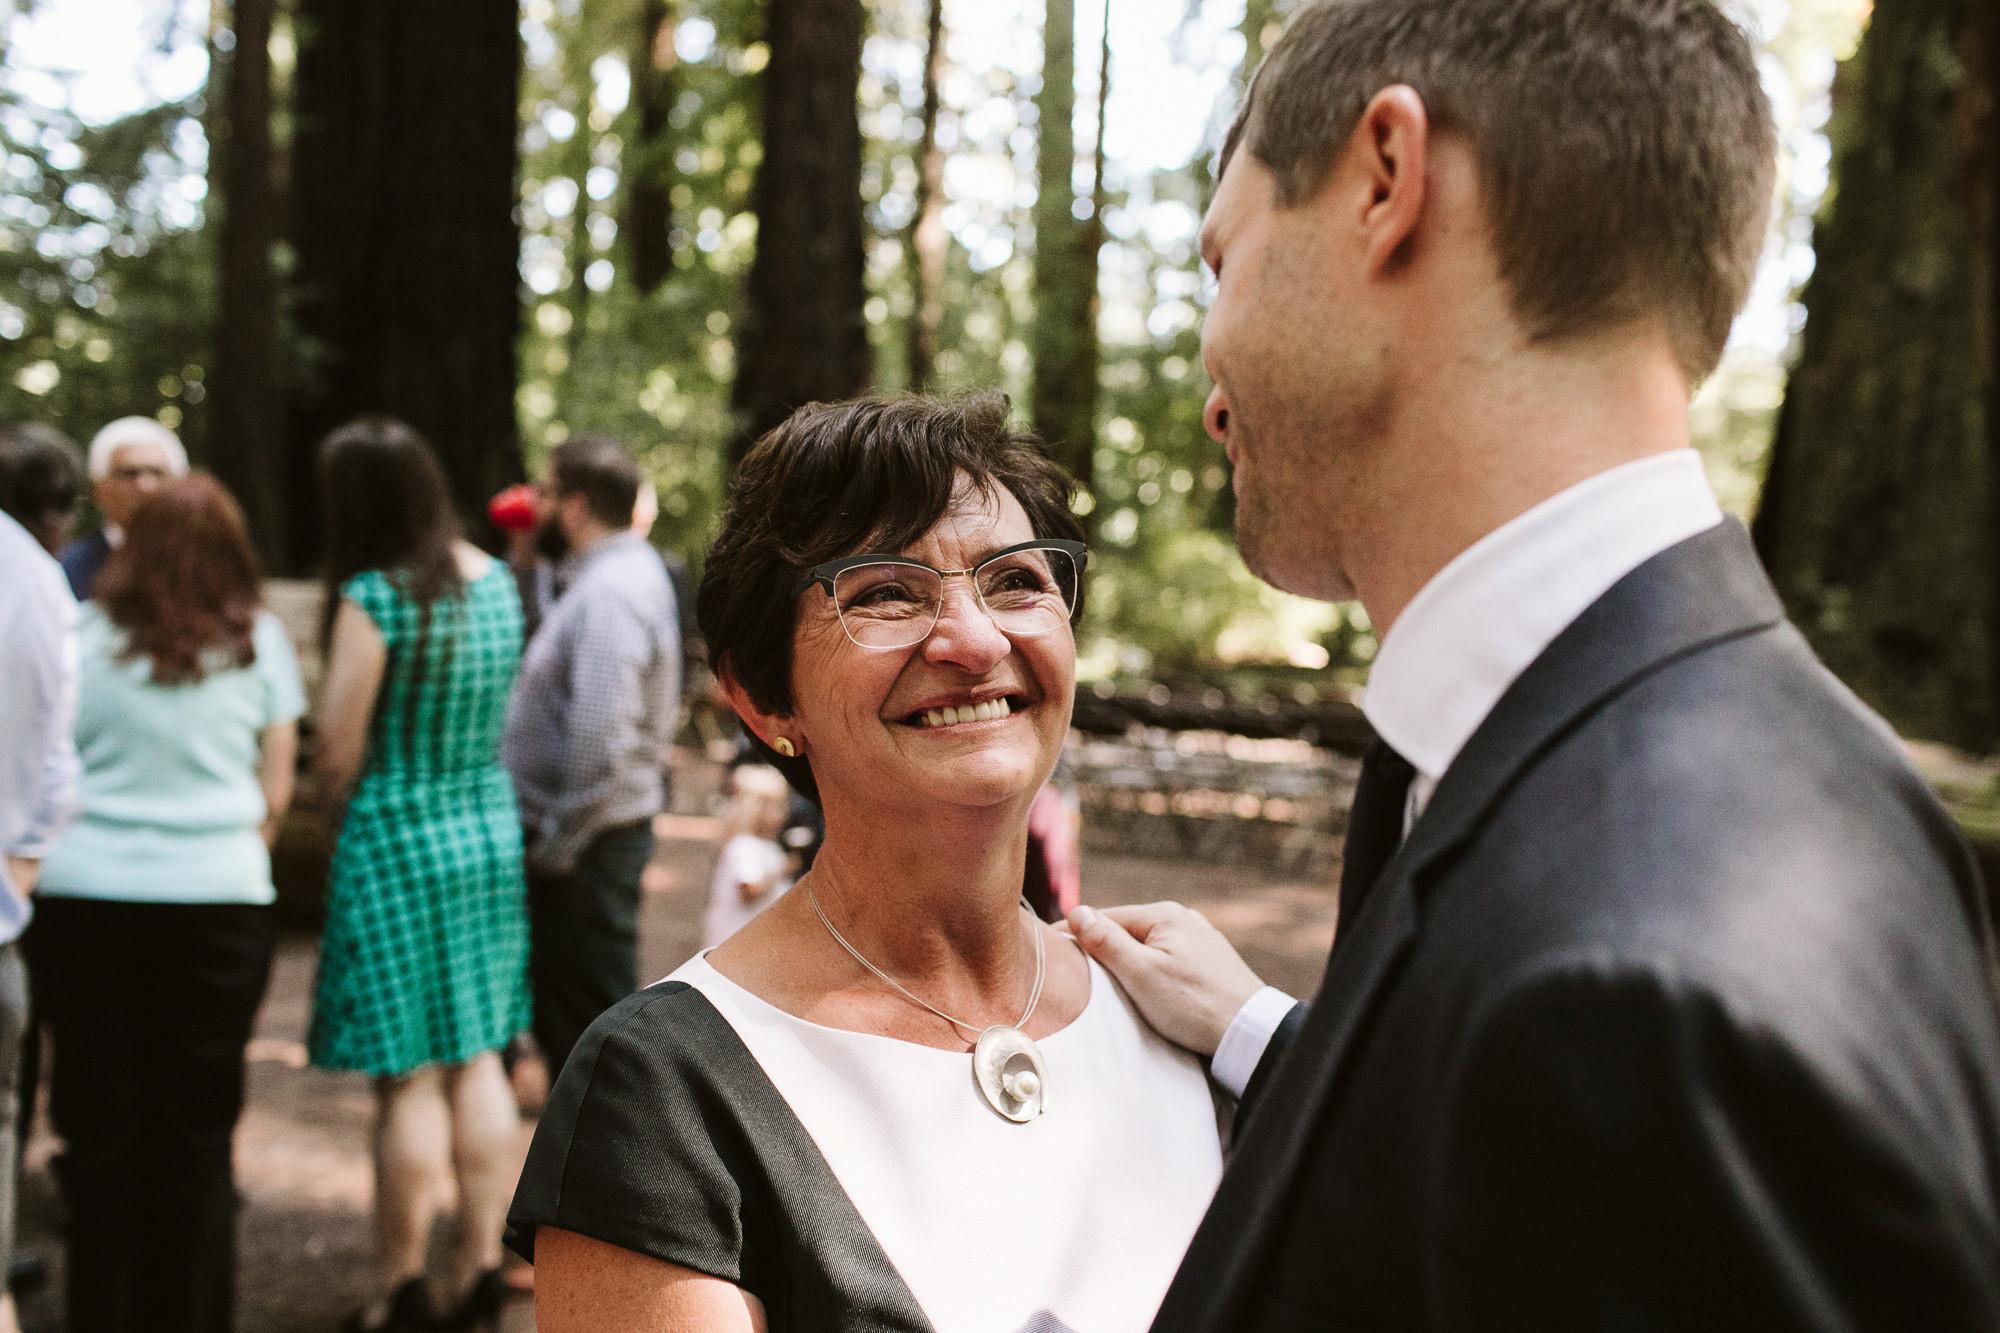 California-wedding-photographer-alfonso-flores-pamplin-groove-228.jpg